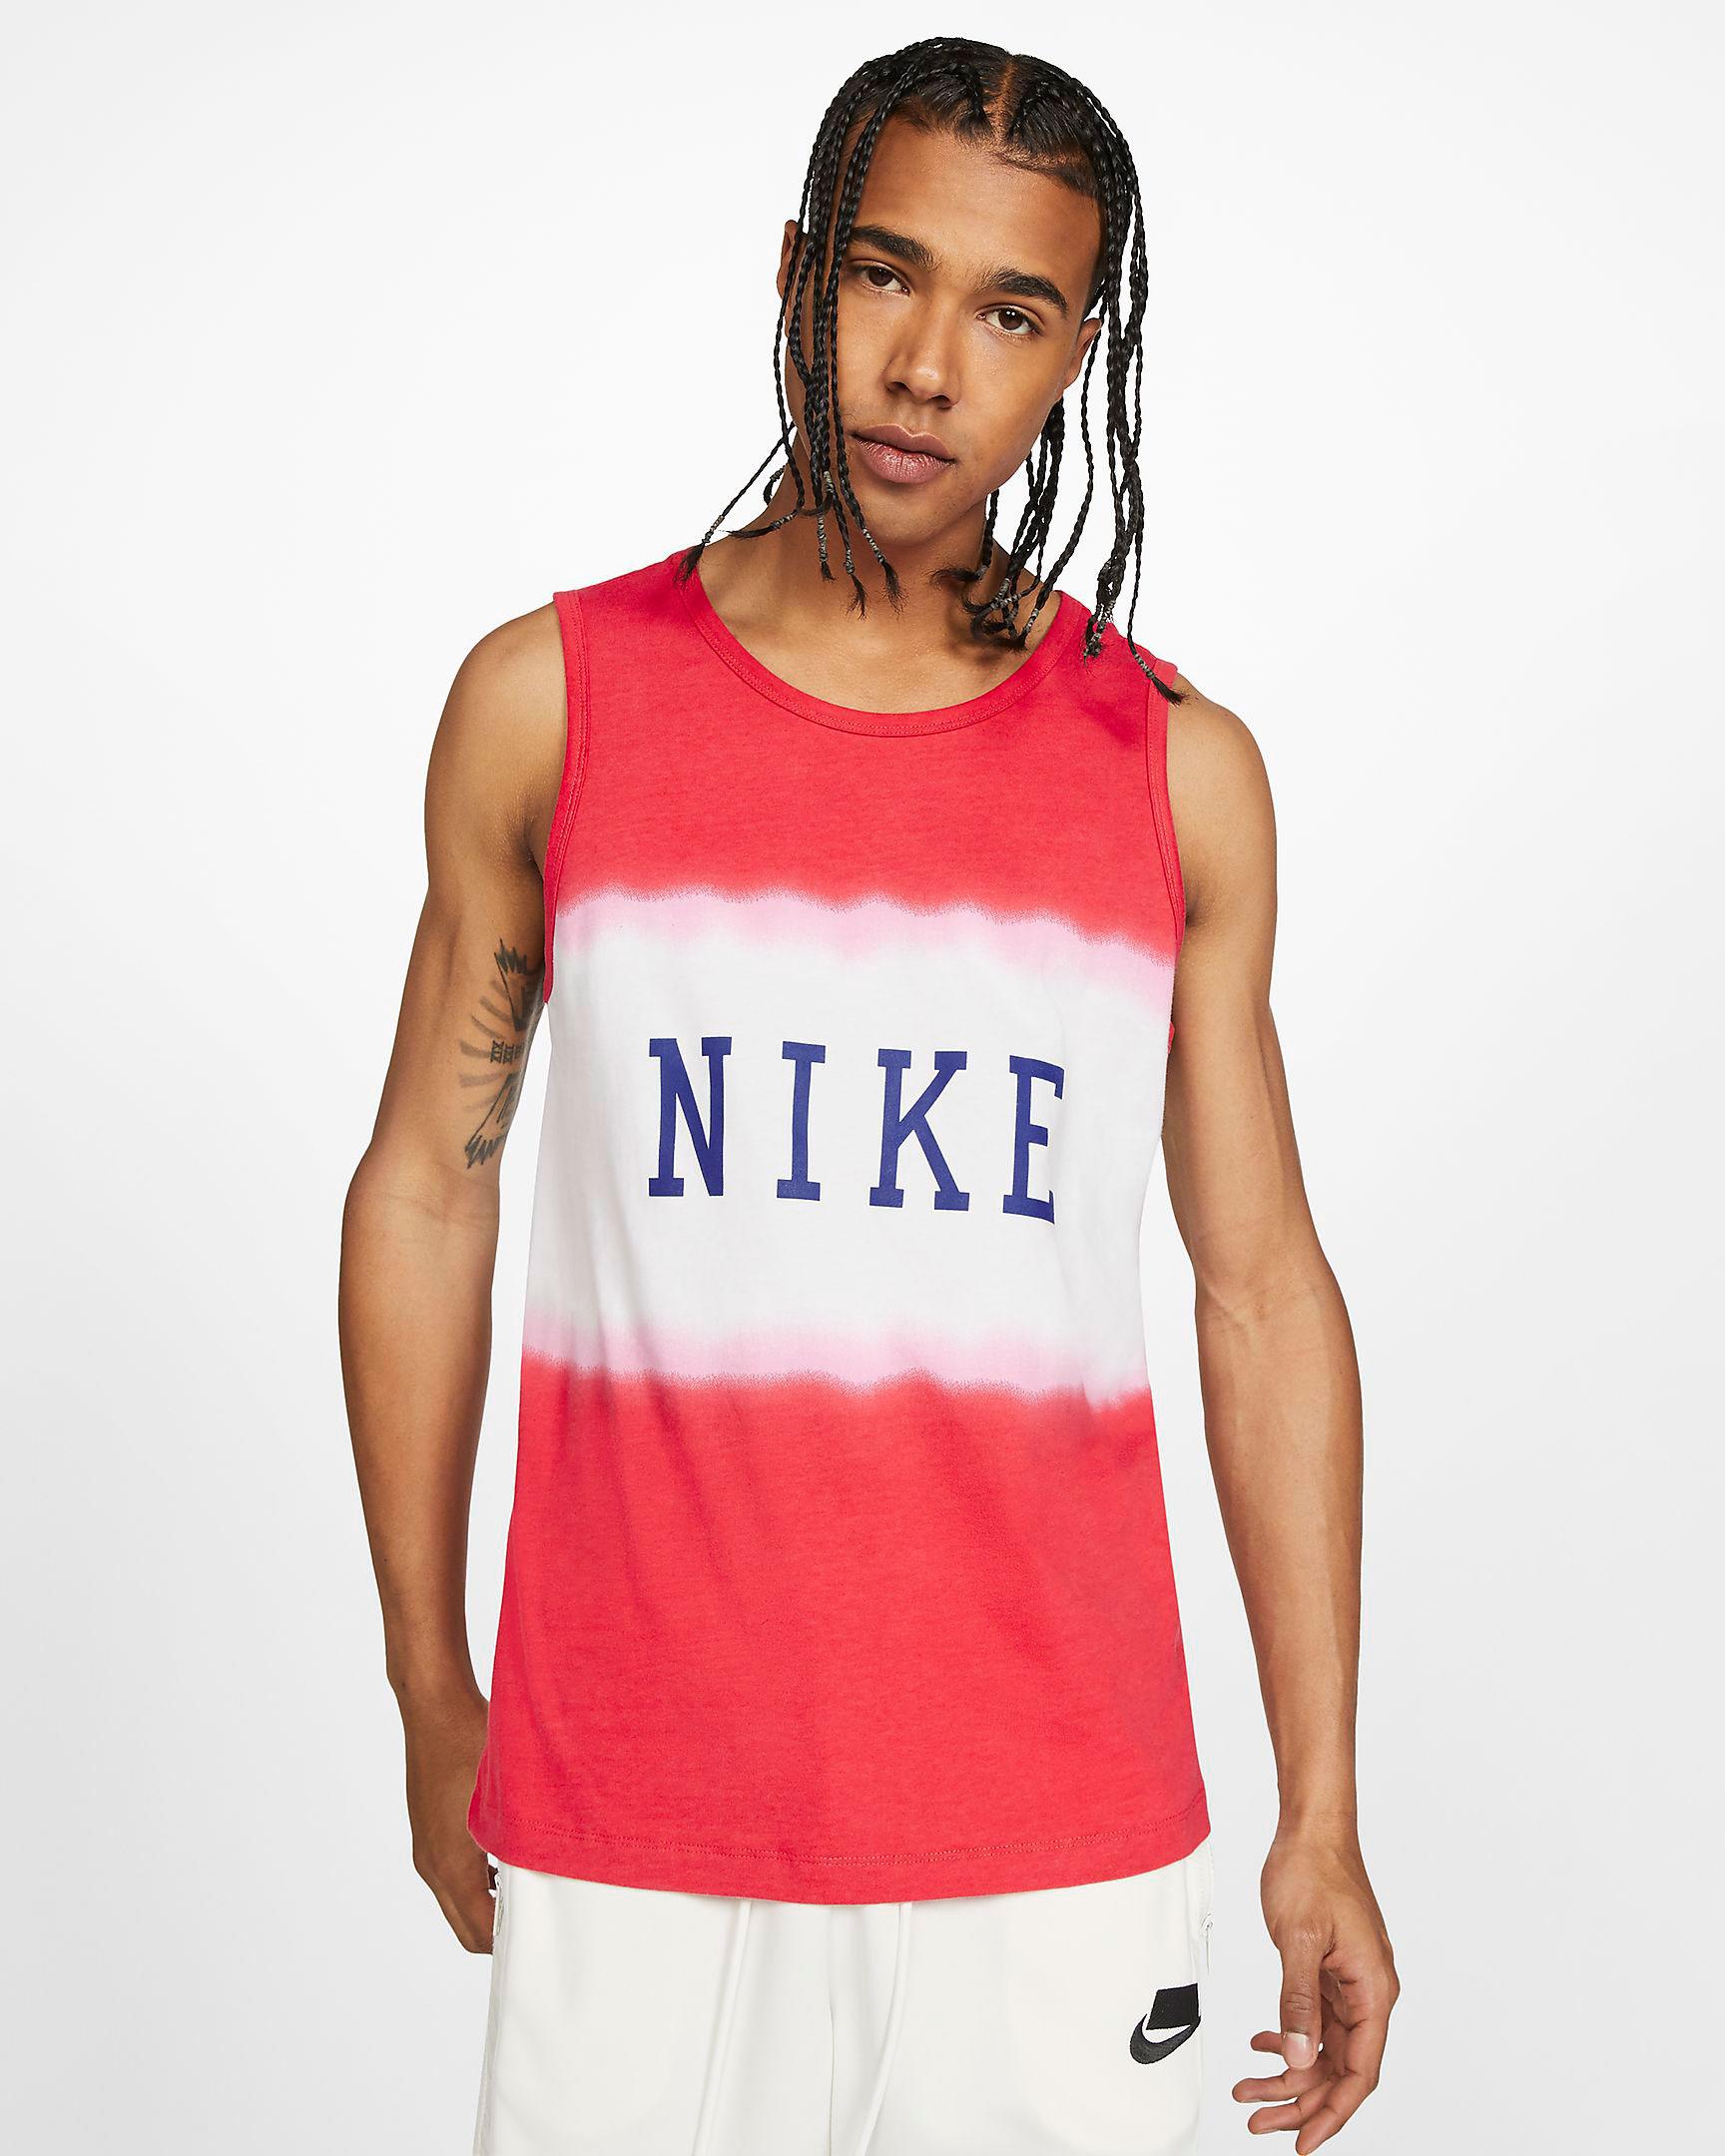 nike-americana-tie-dye-tank-top-1